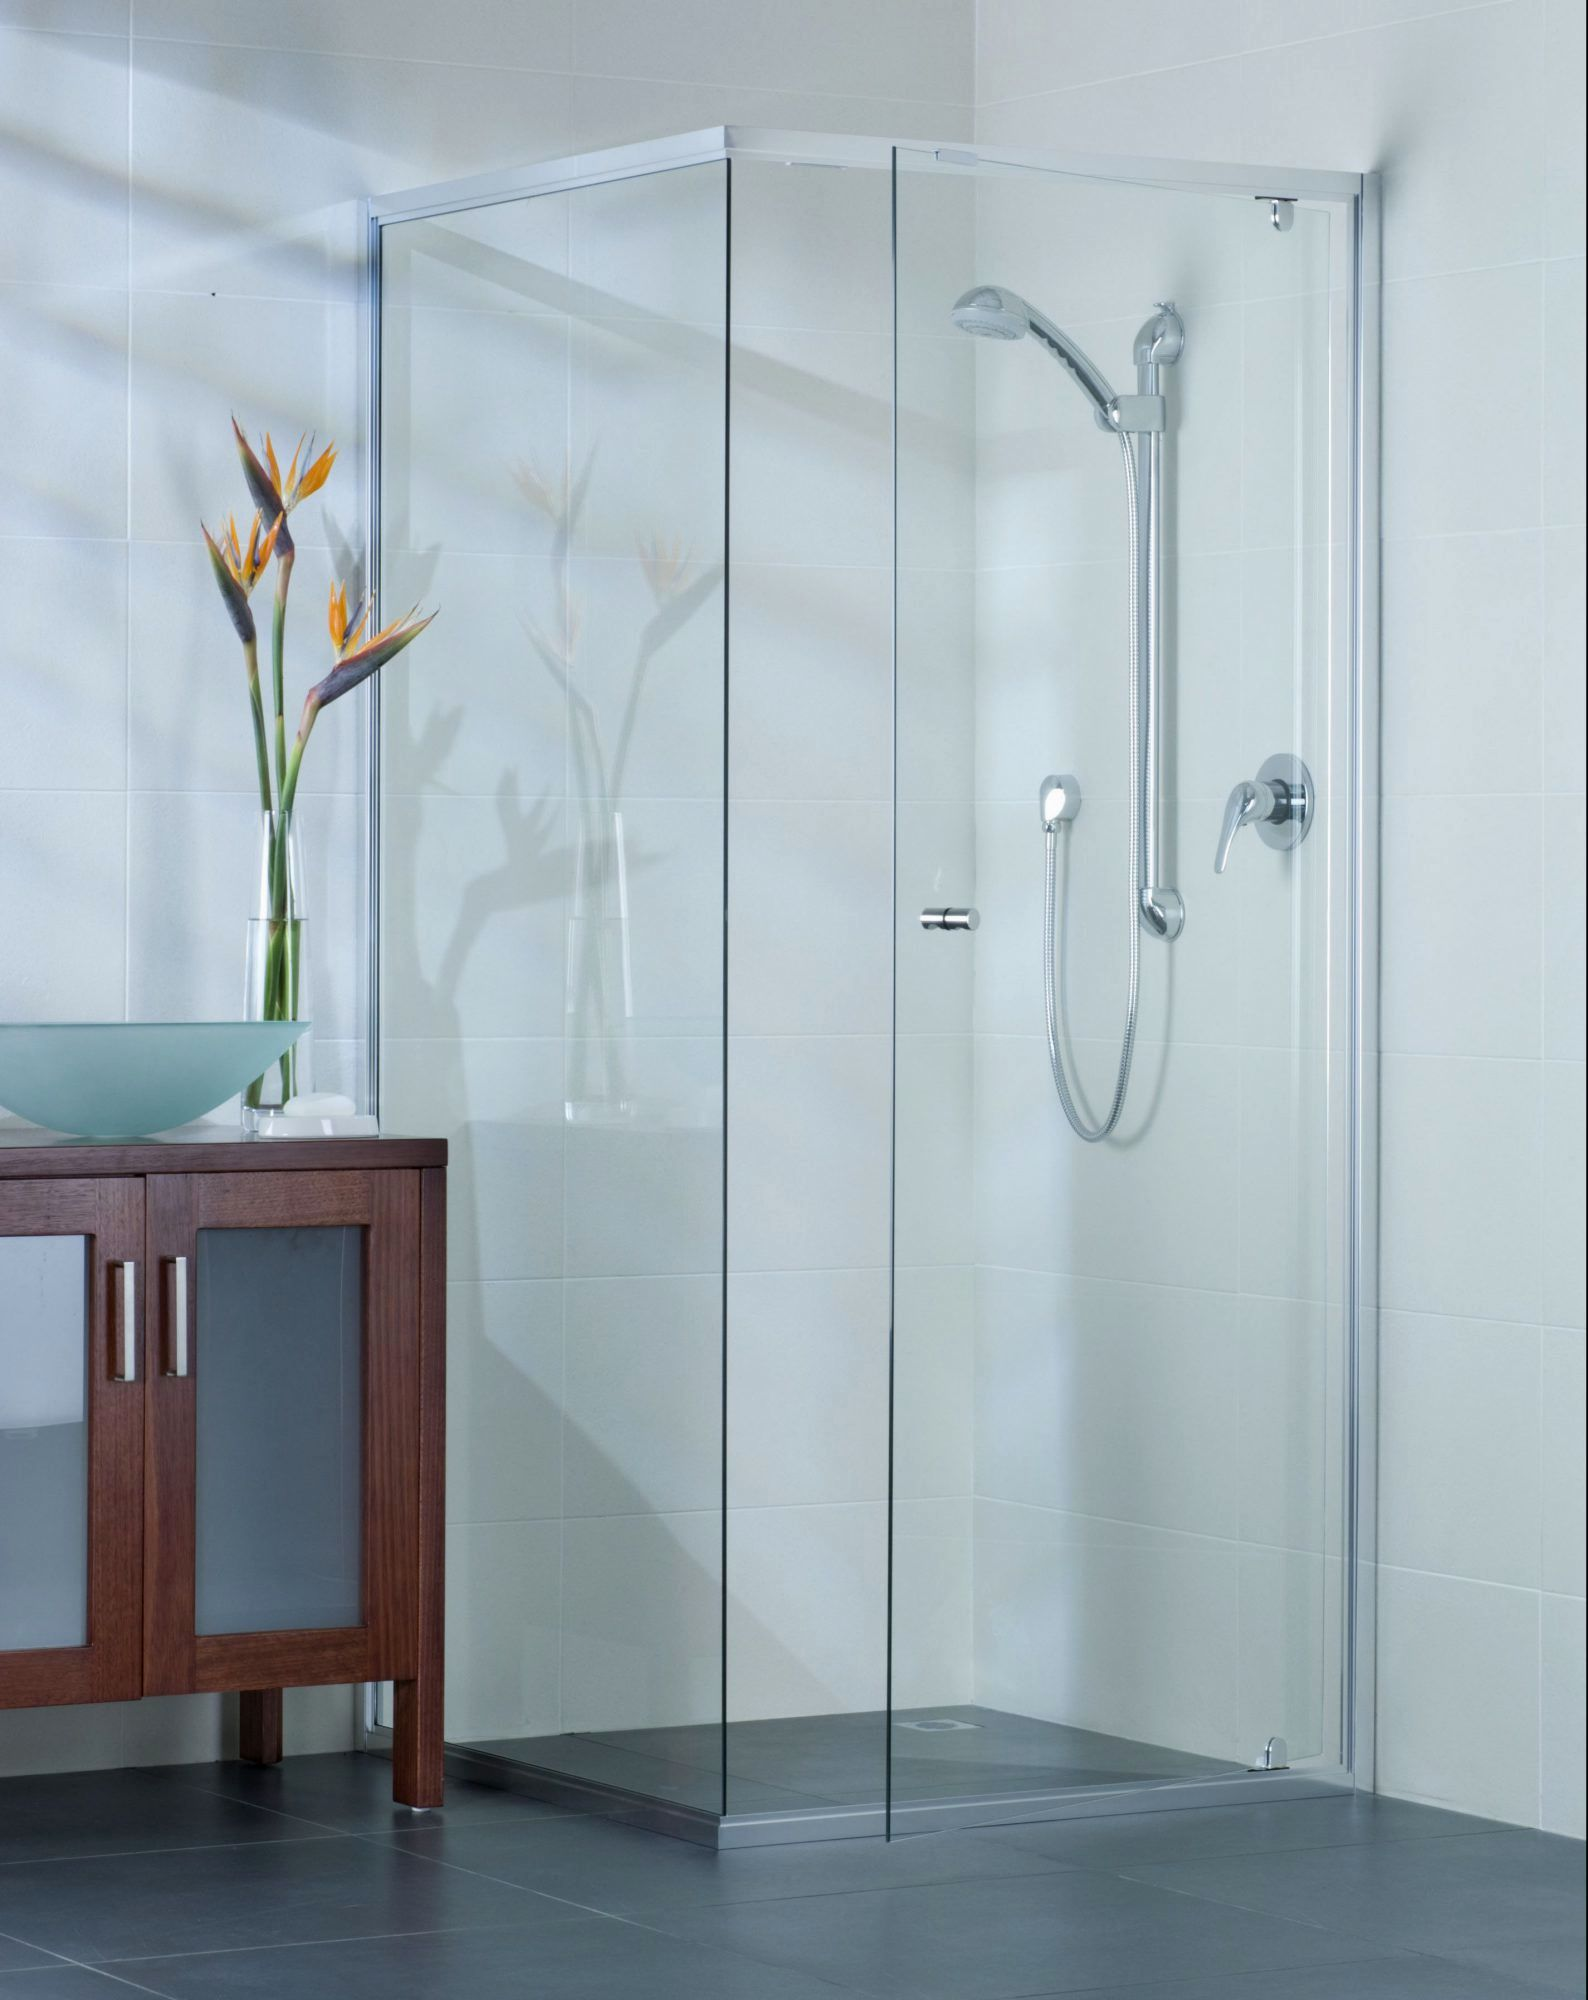 Latest Lowes Bathroom Vanity Gallery - Bathroom Design Ideas Gallery ...